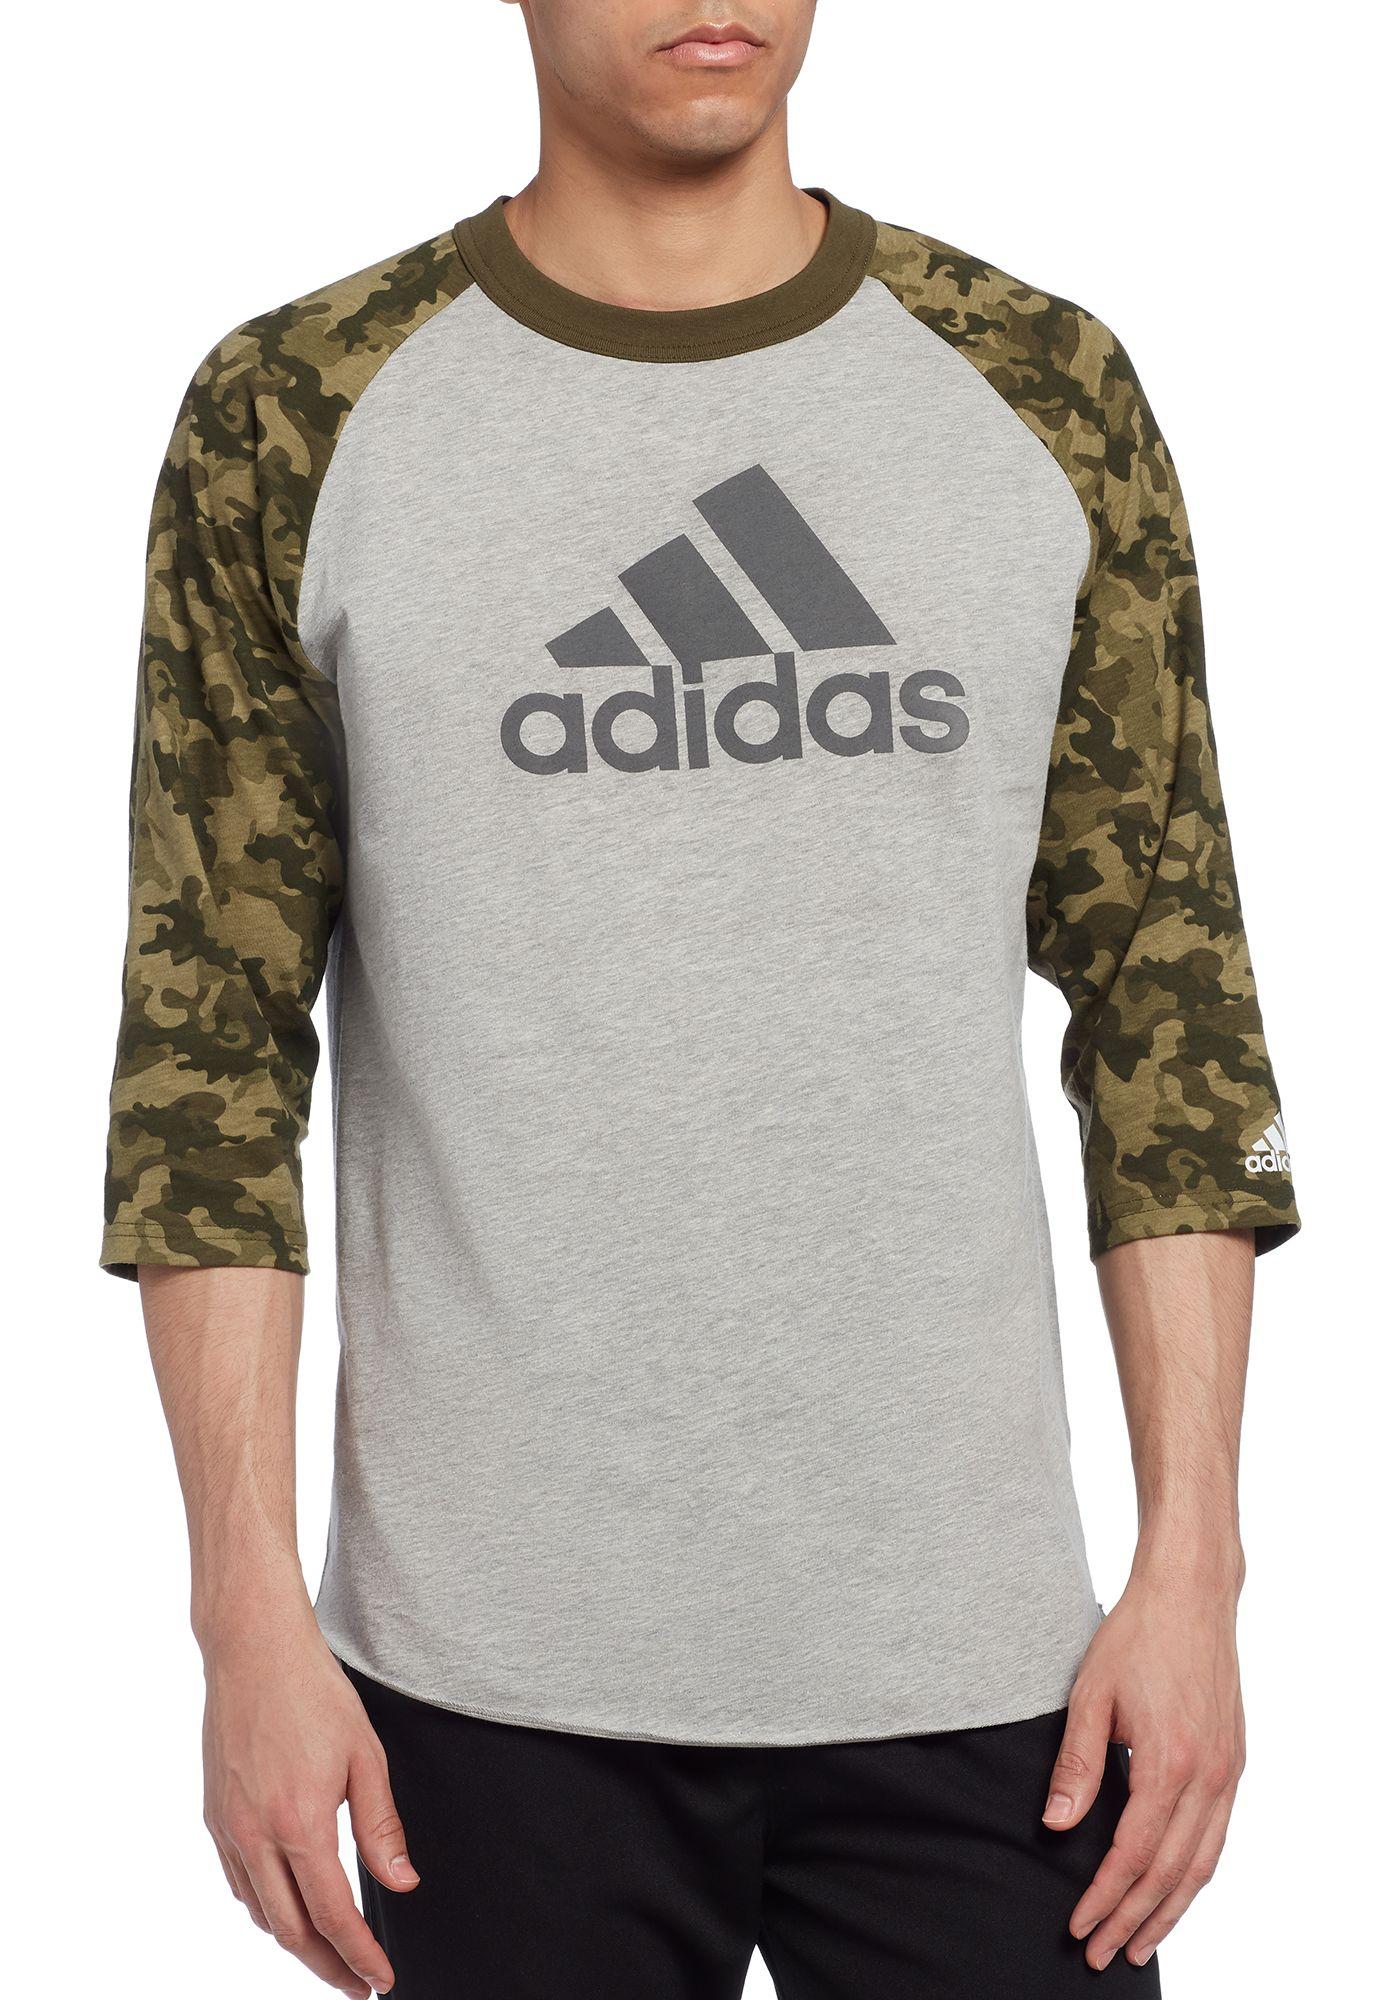 adidas Men's Triple Stripe Printed ¾ Sleeve Baseball Shirt